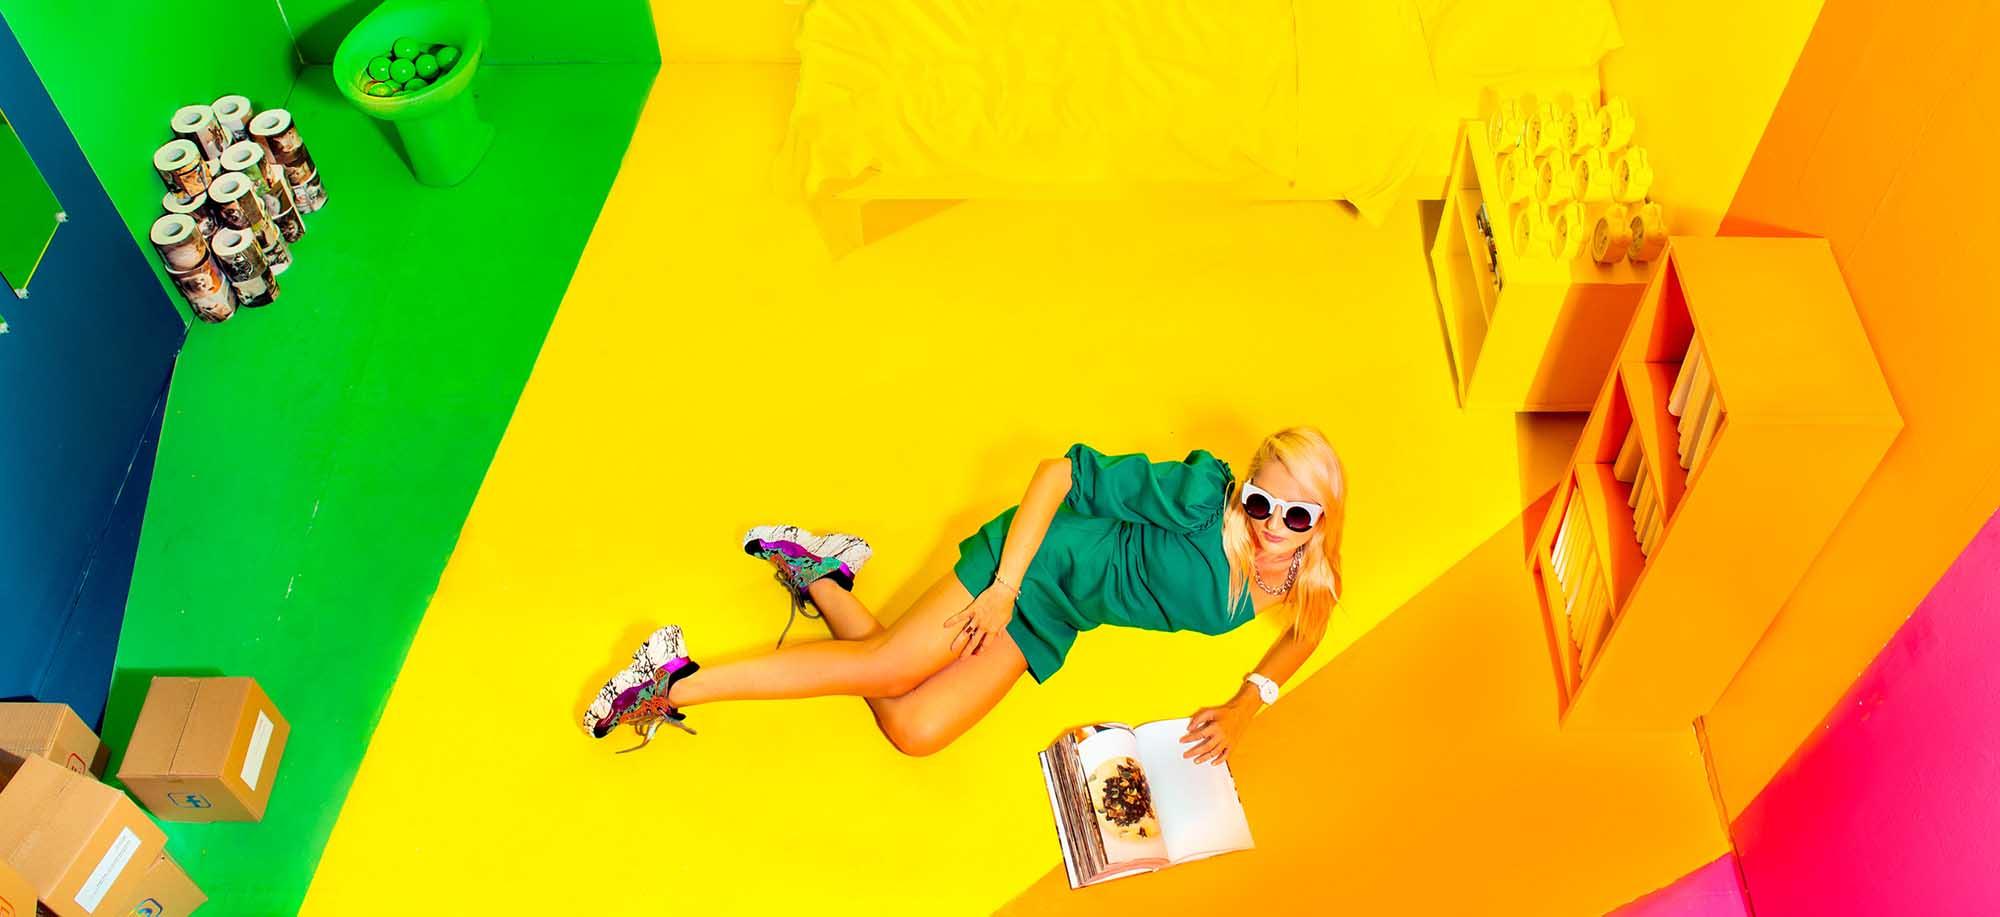 Fashion Israel, צלם דניס גרצקיס, סטיילינג דניאל צרויה, איפור נינה בלקניה, דוגמנית עינת רוכמן,שמלה: זארה, נעליים: אוסף פרטי, משקפיים: קרולינה למקה, שרשרת: אוסף פרטי-1